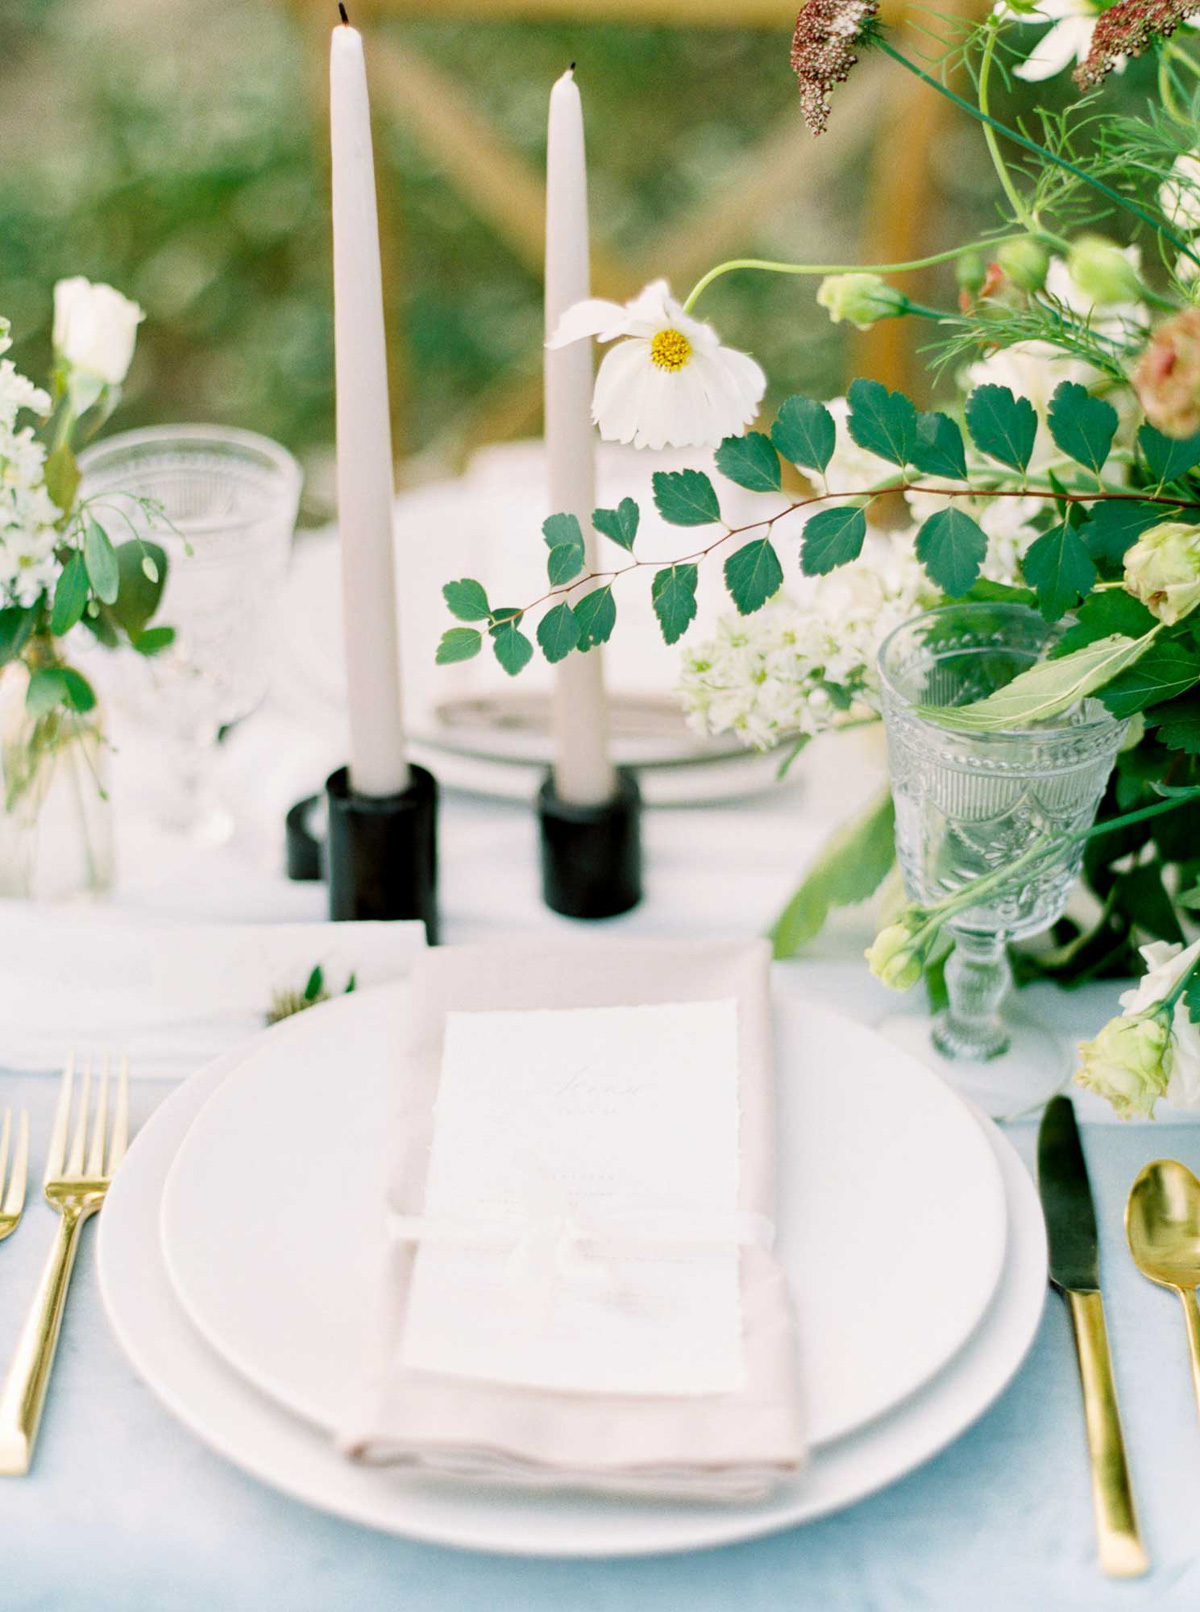 kayla-yestal-vineyard-bride-swish-list-woodland-weddings-niagara-wedding-editorial-55.jpg